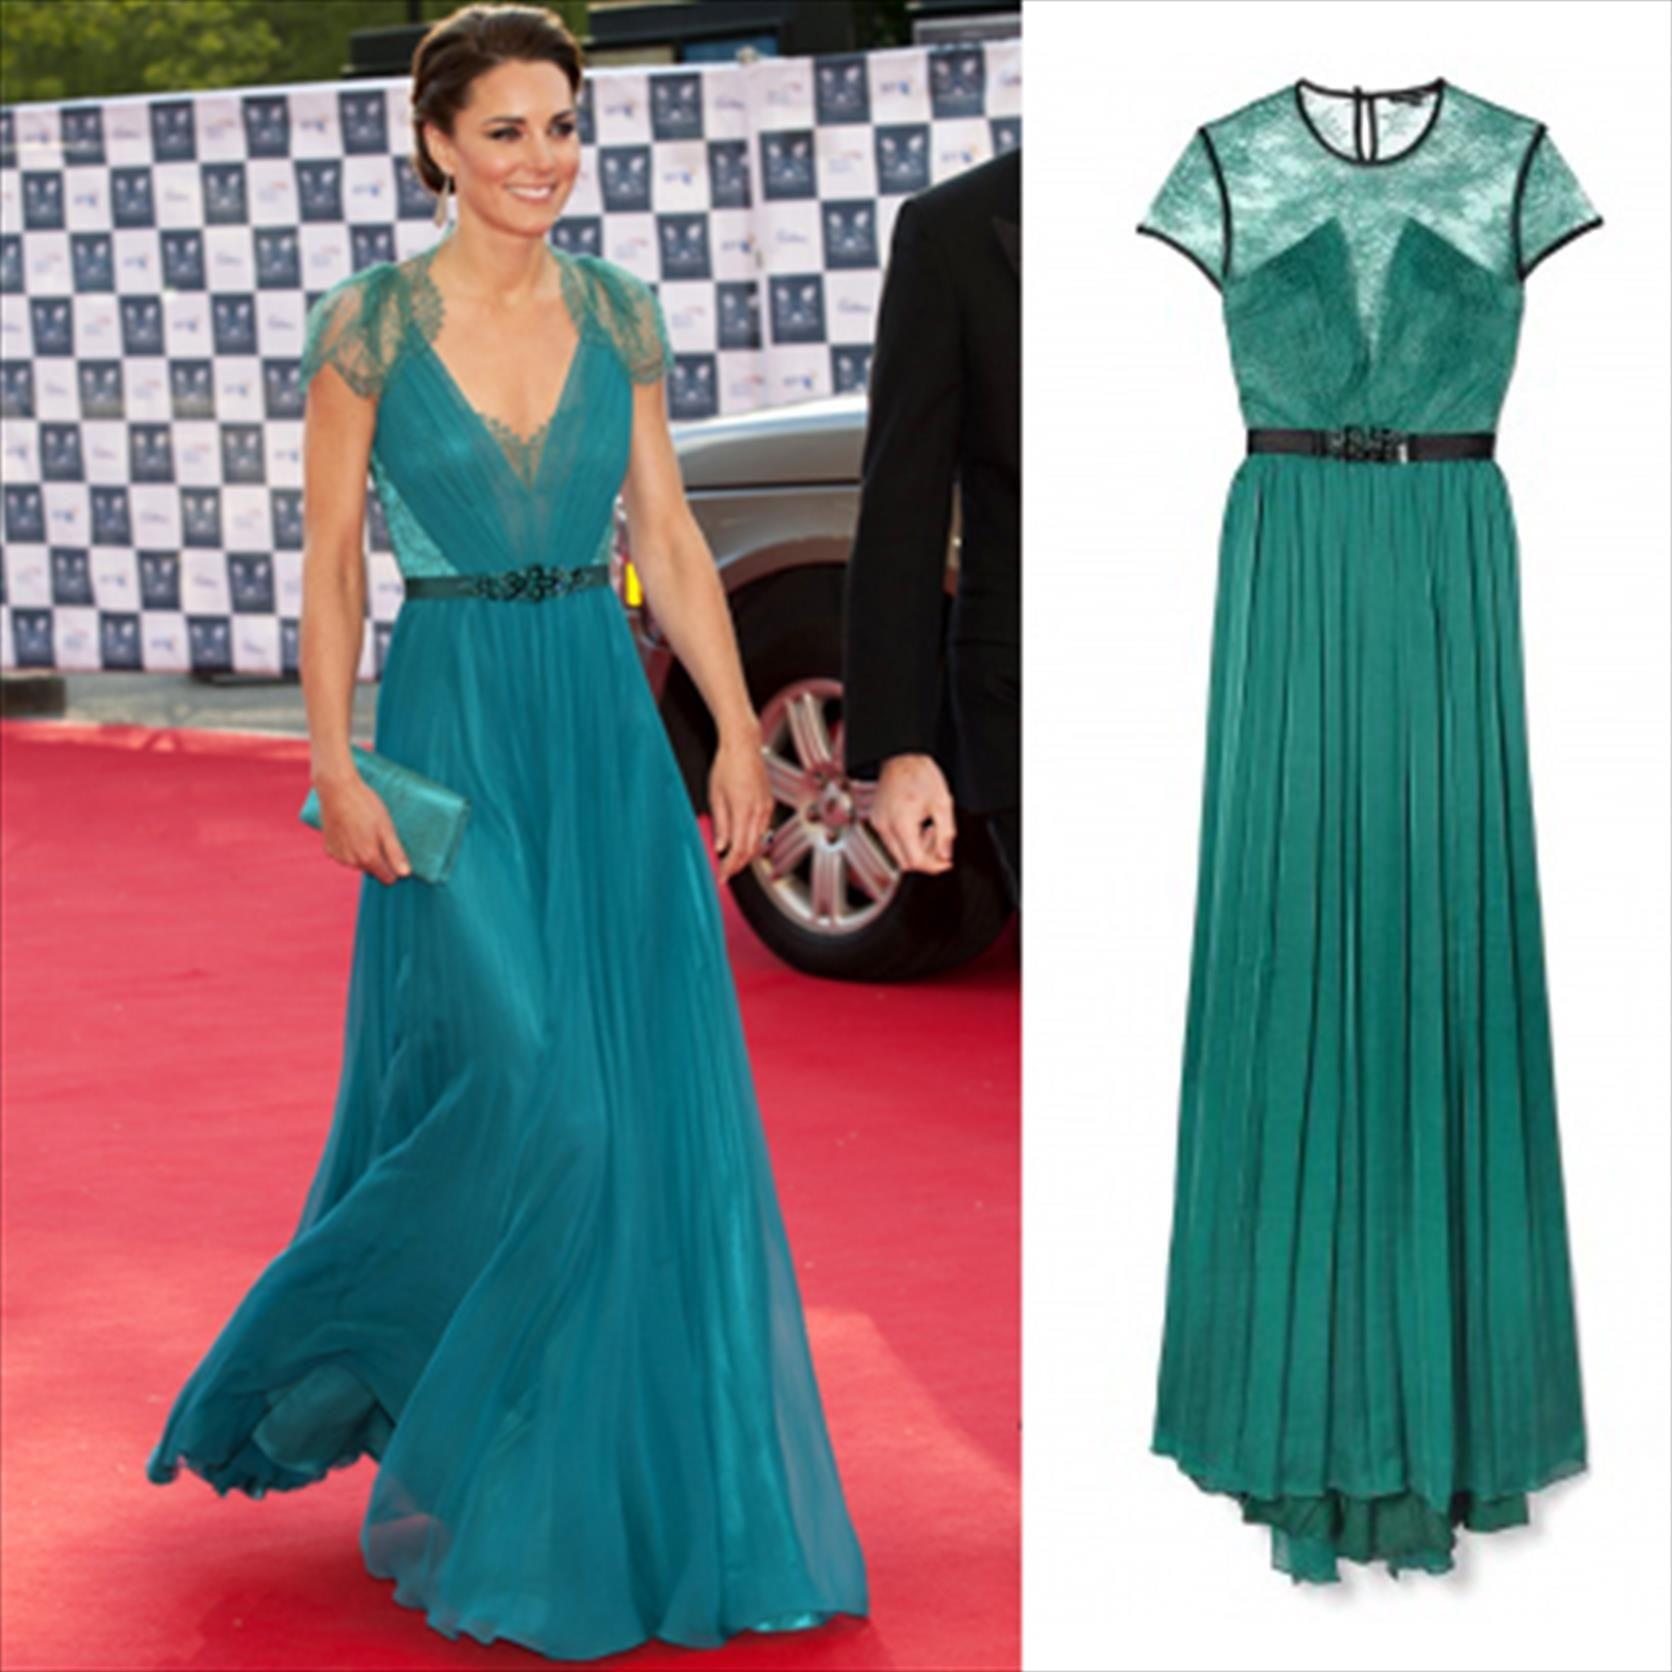 Kate Middleton: Catherine Deane Dress   My Style   Pinterest